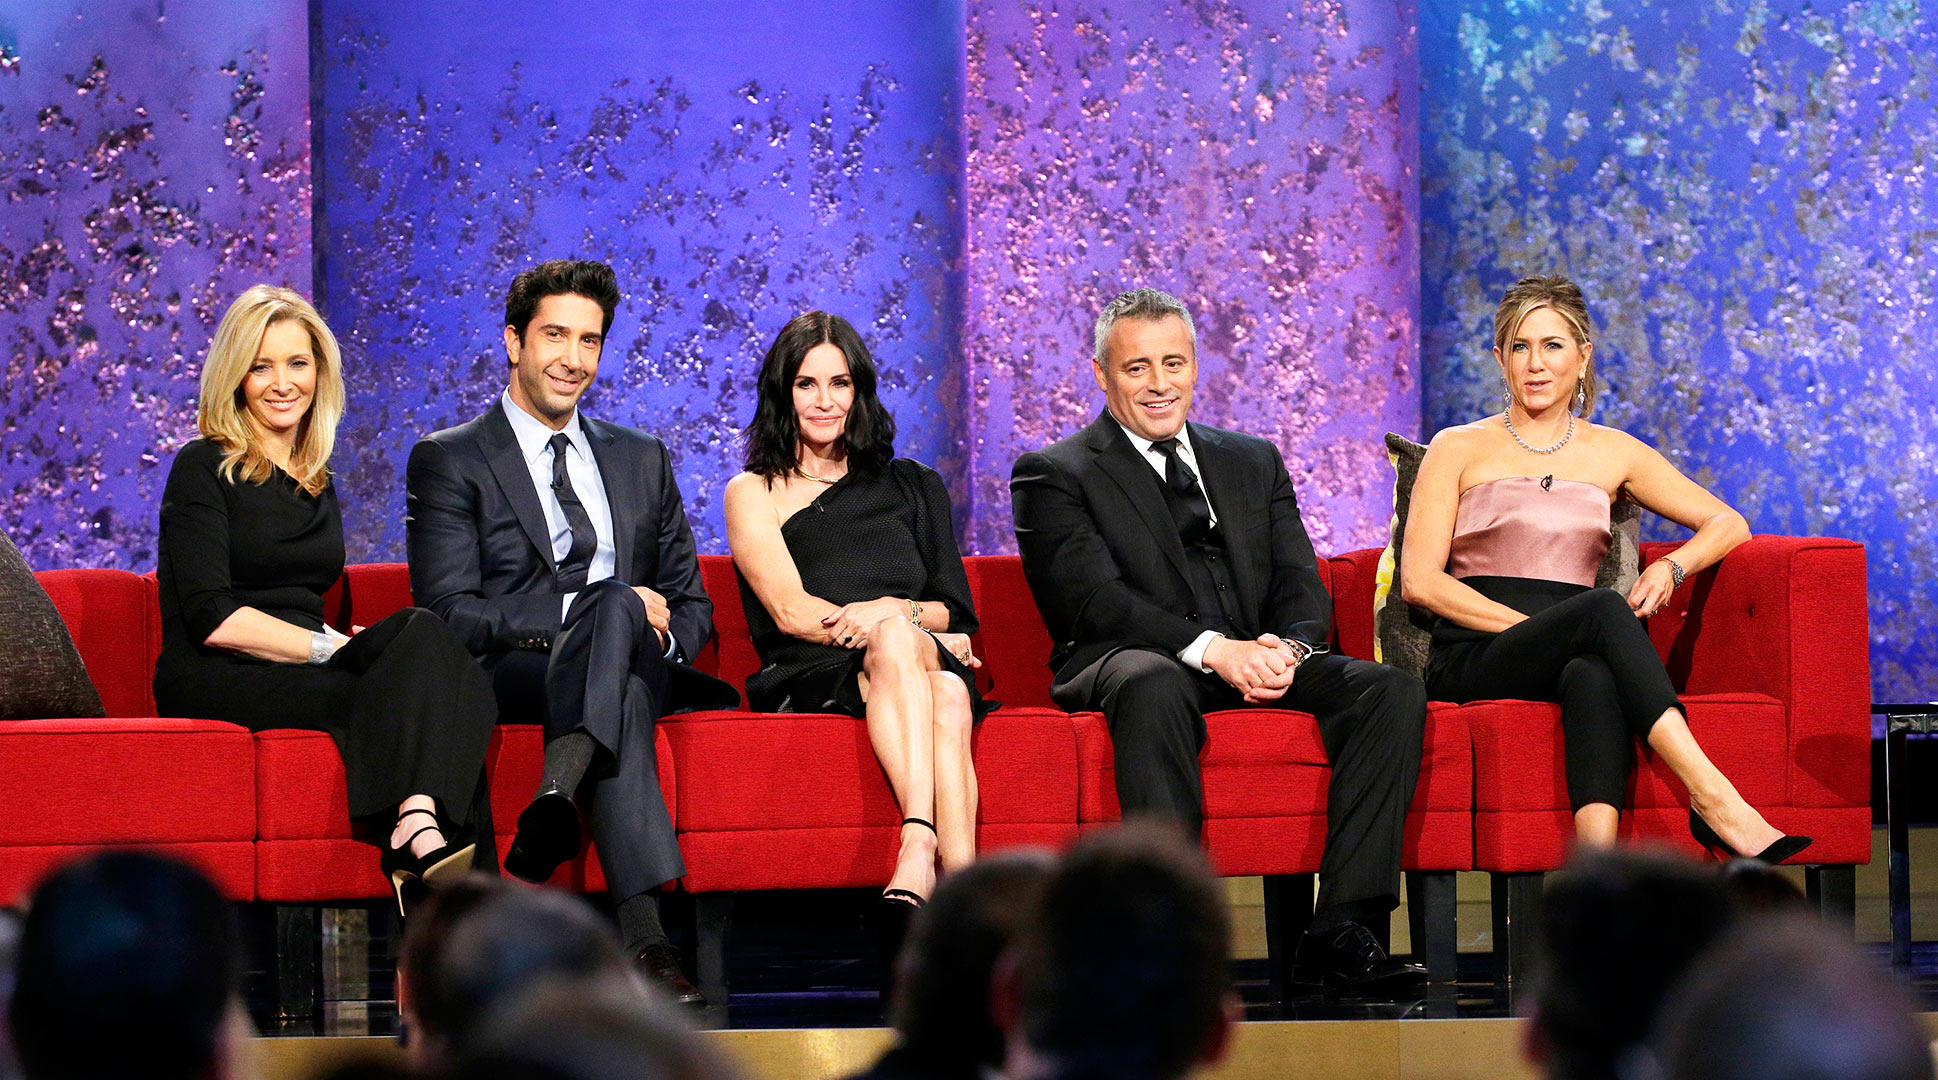 Lisa Kudrow, David Schwimmer, Courteney Cox, Matt LeBlanc, Jennifer Aniston